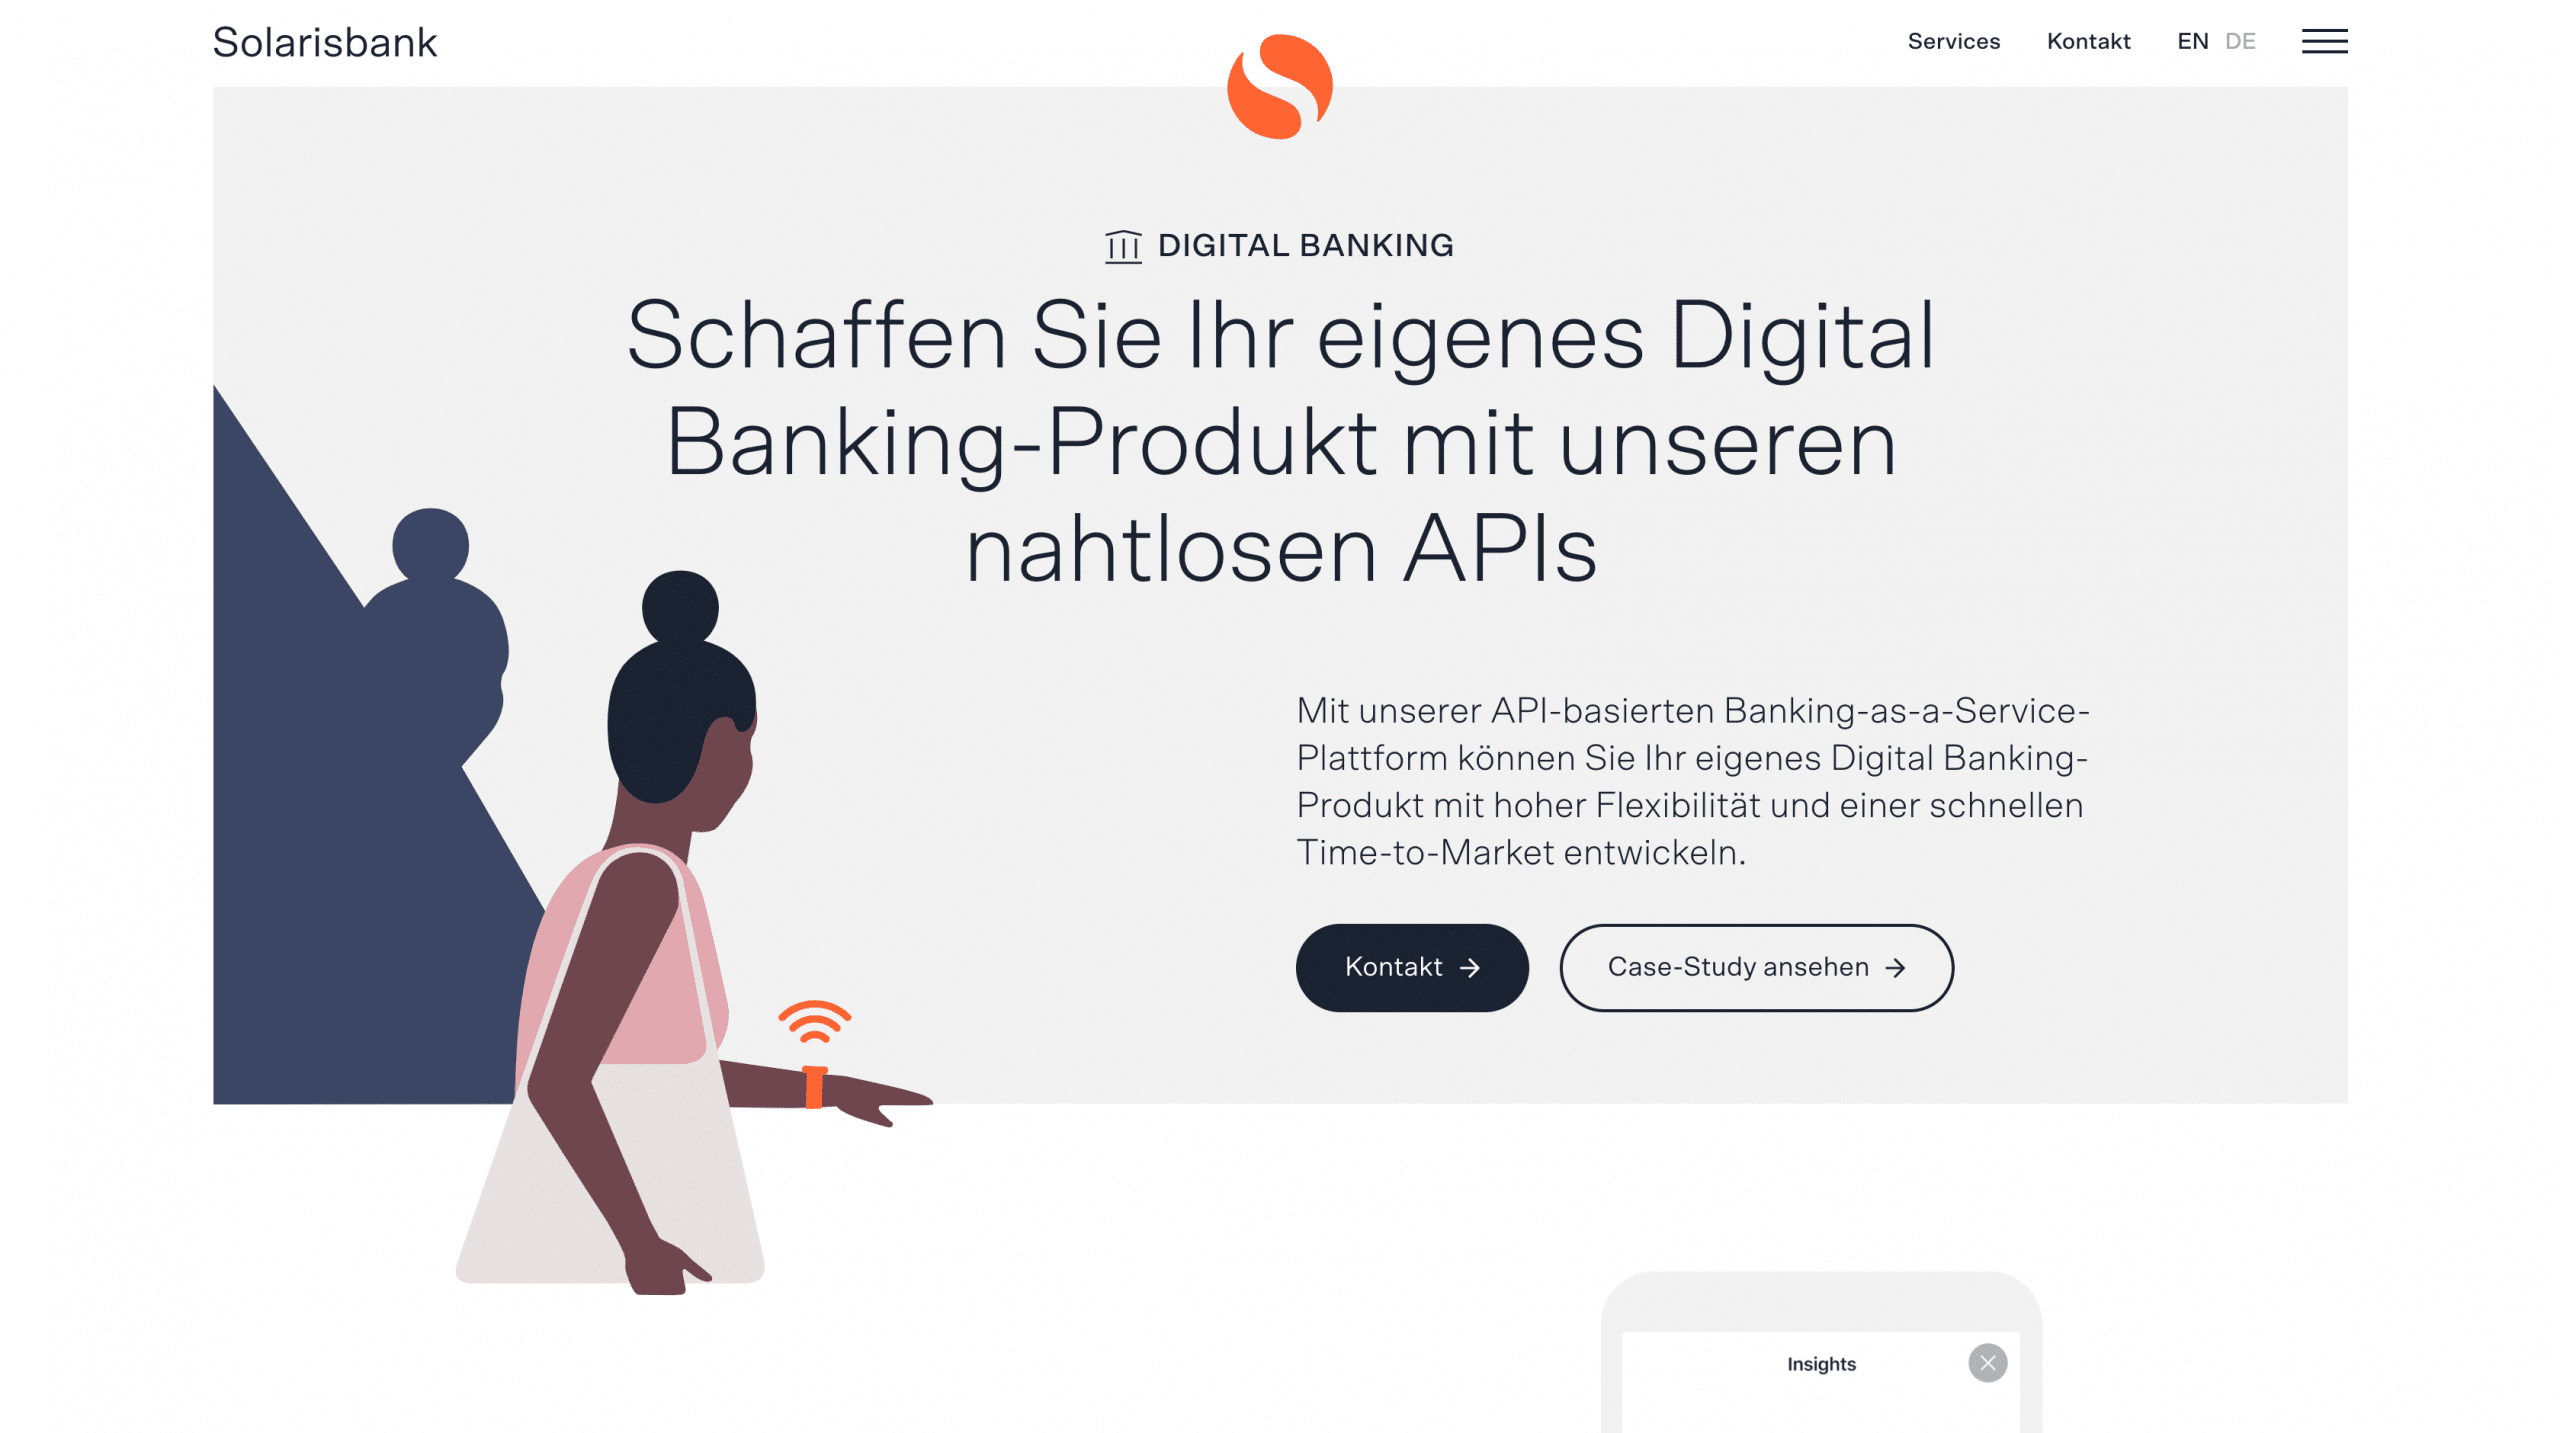 Solarisbank Digital Banking